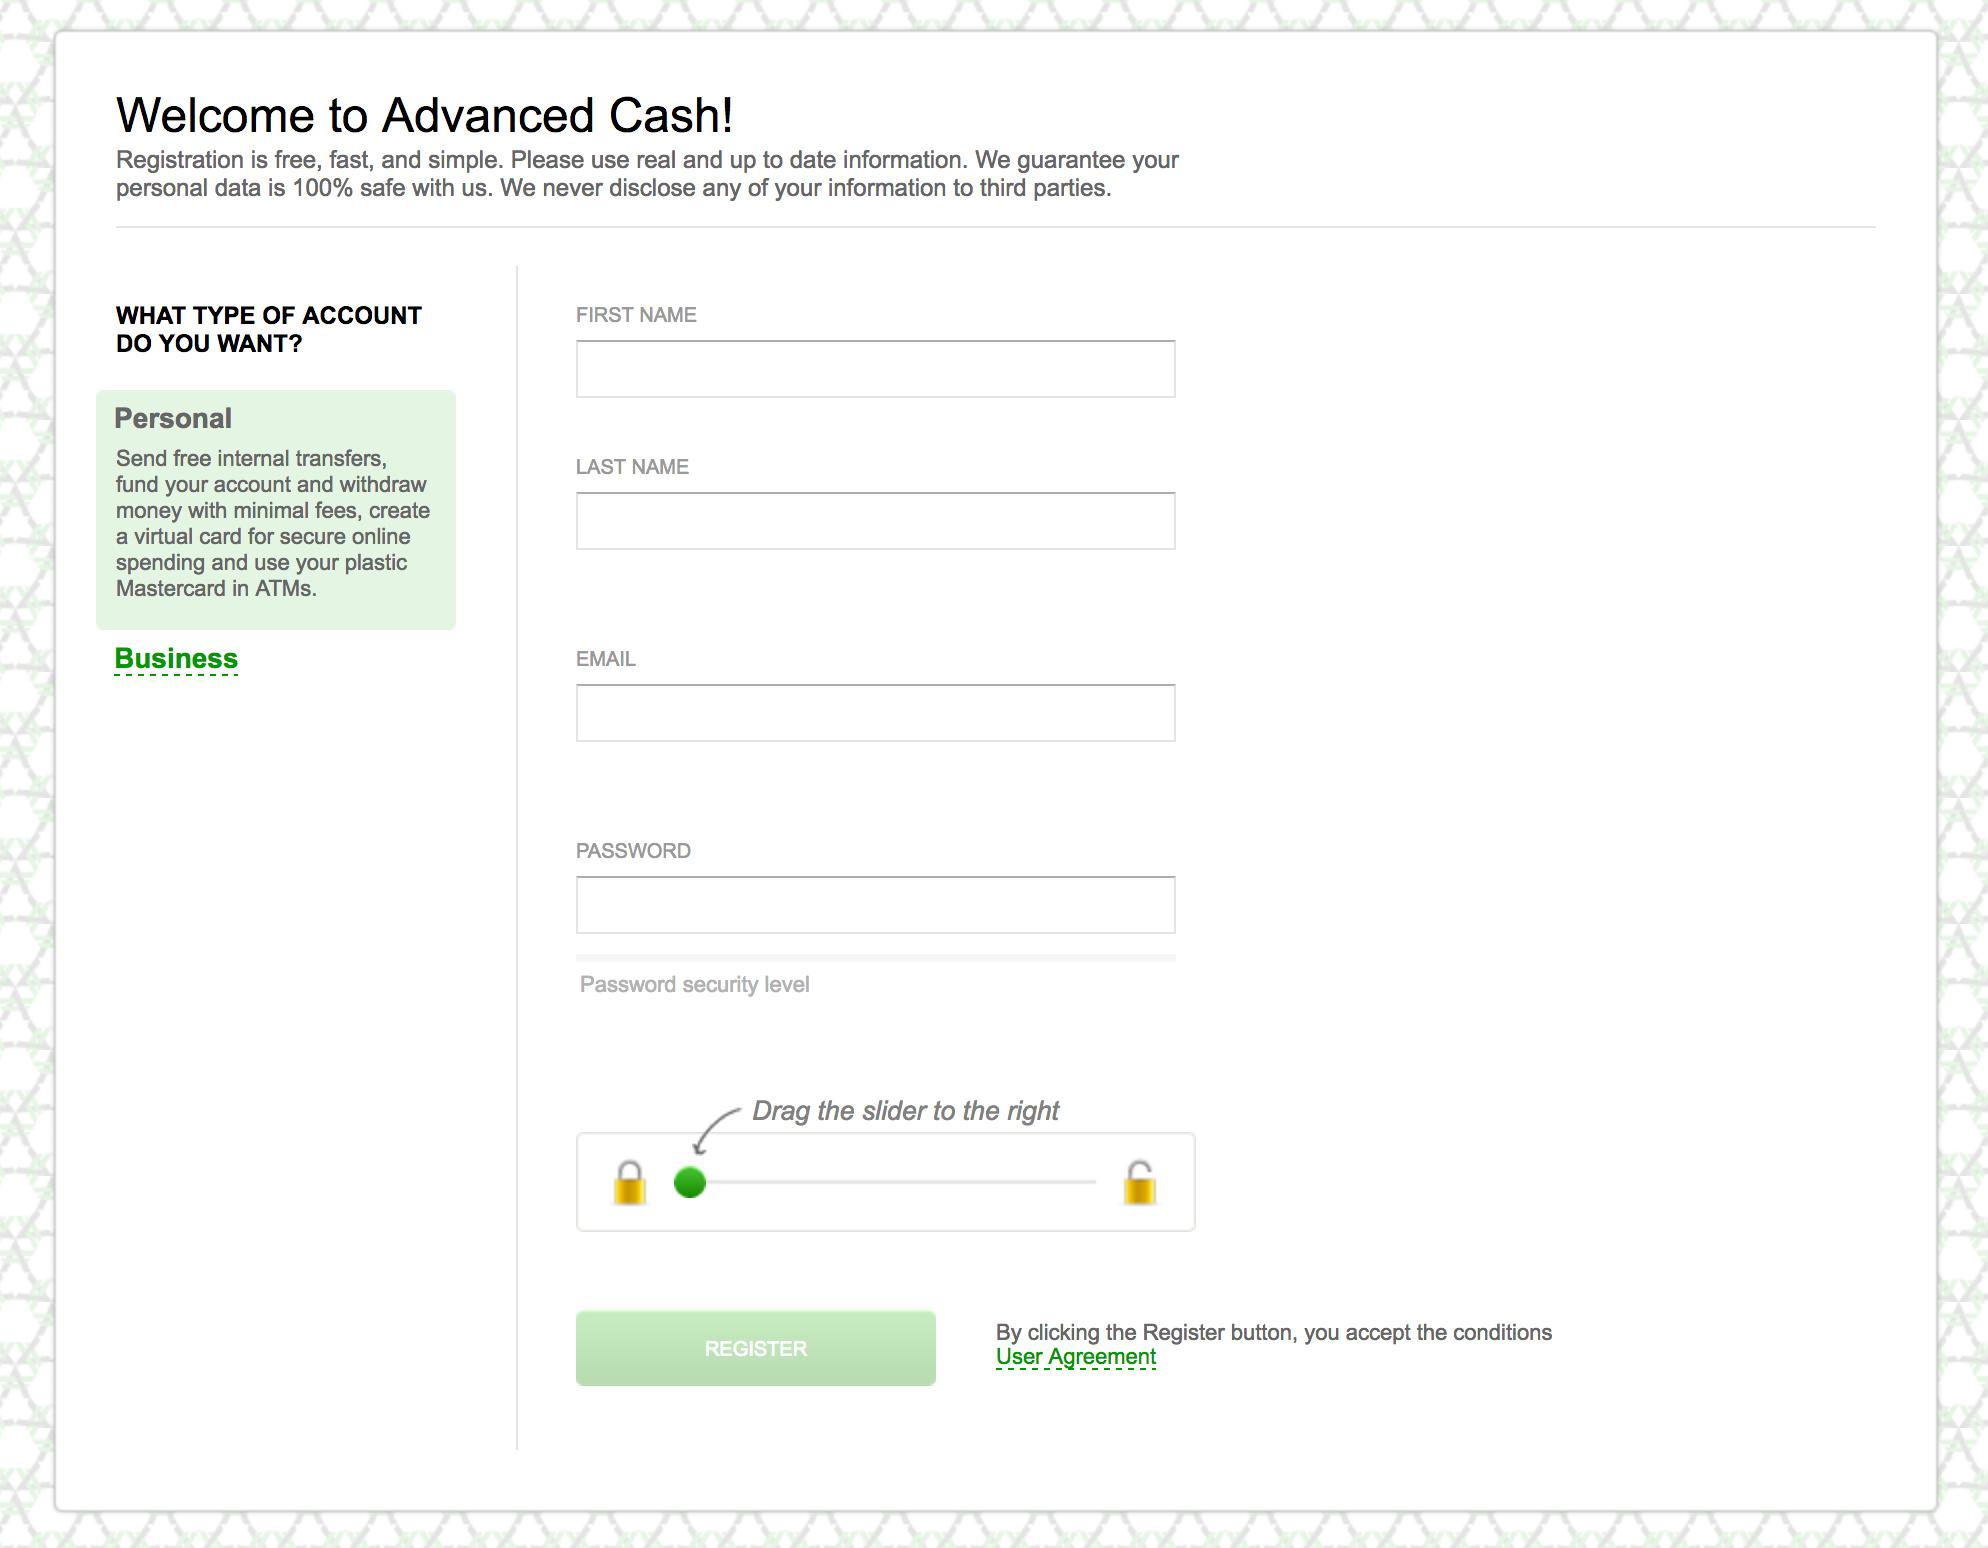 Anmeldung bei AdvCash